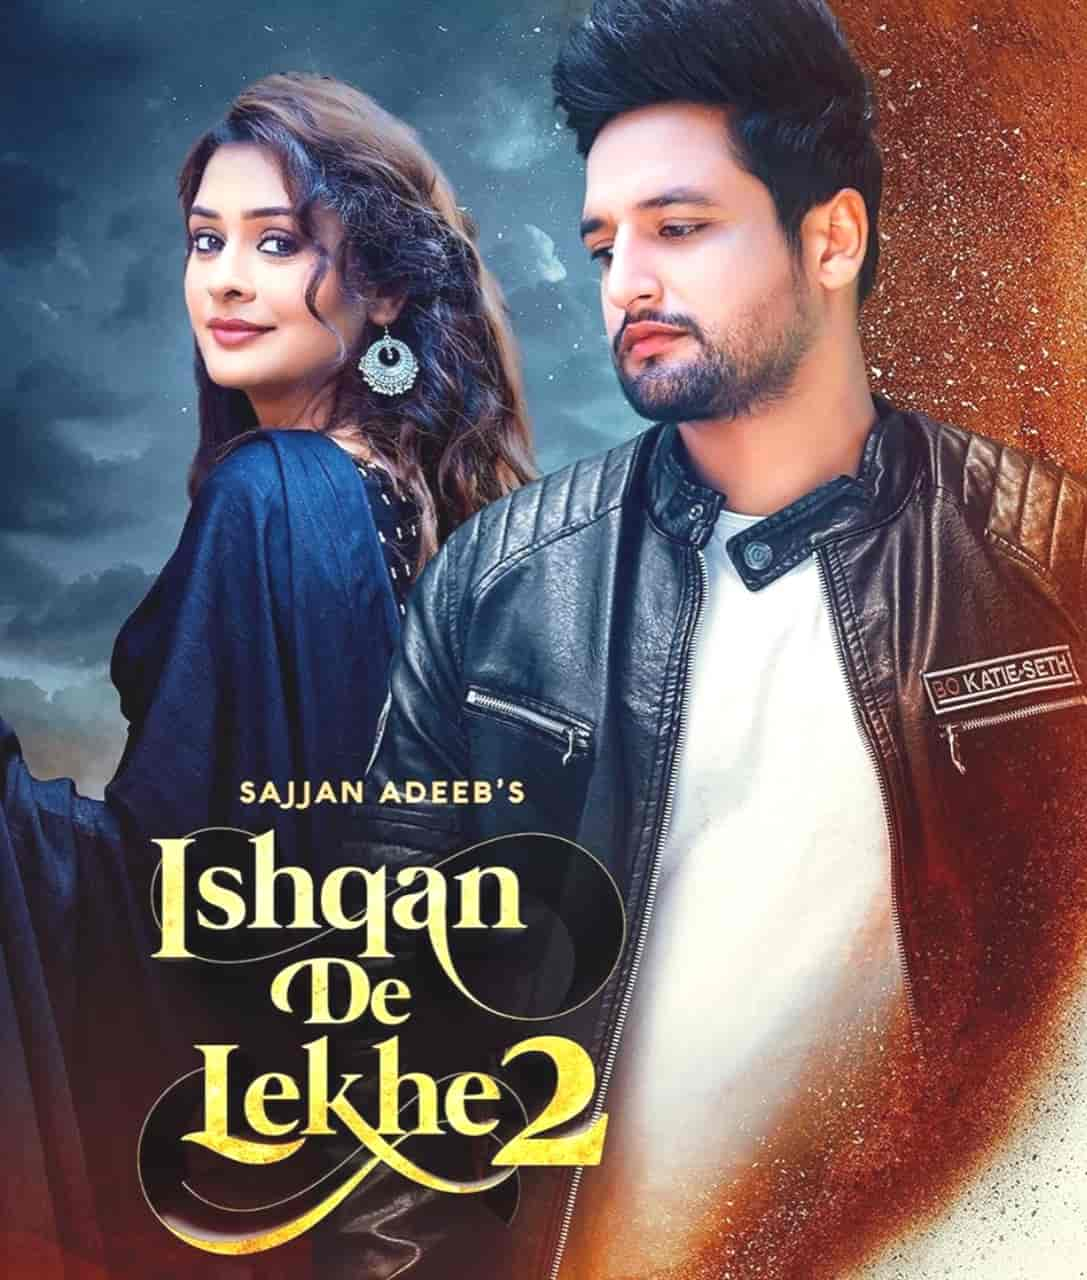 Ishqan Se Lekhe 2 Punjabi Song Image Features Sajjan Adeeb